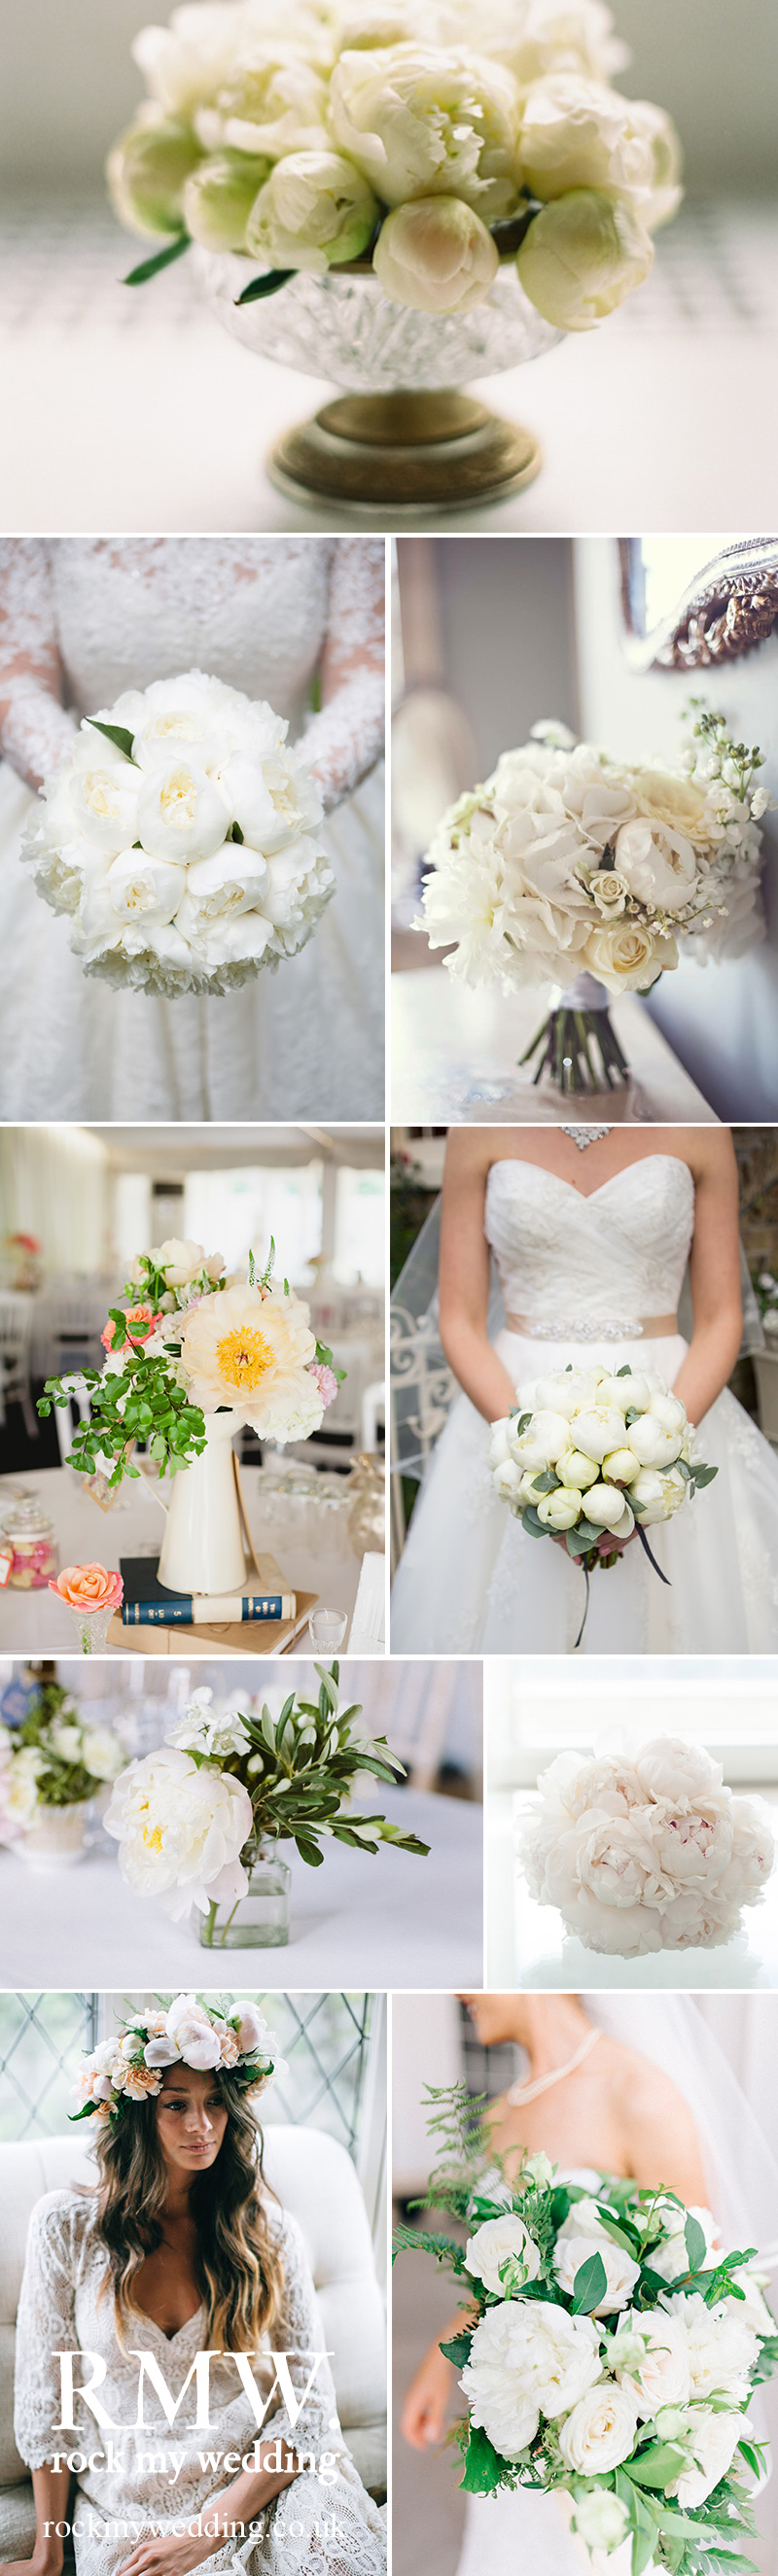 White Peony Wedding Flowers